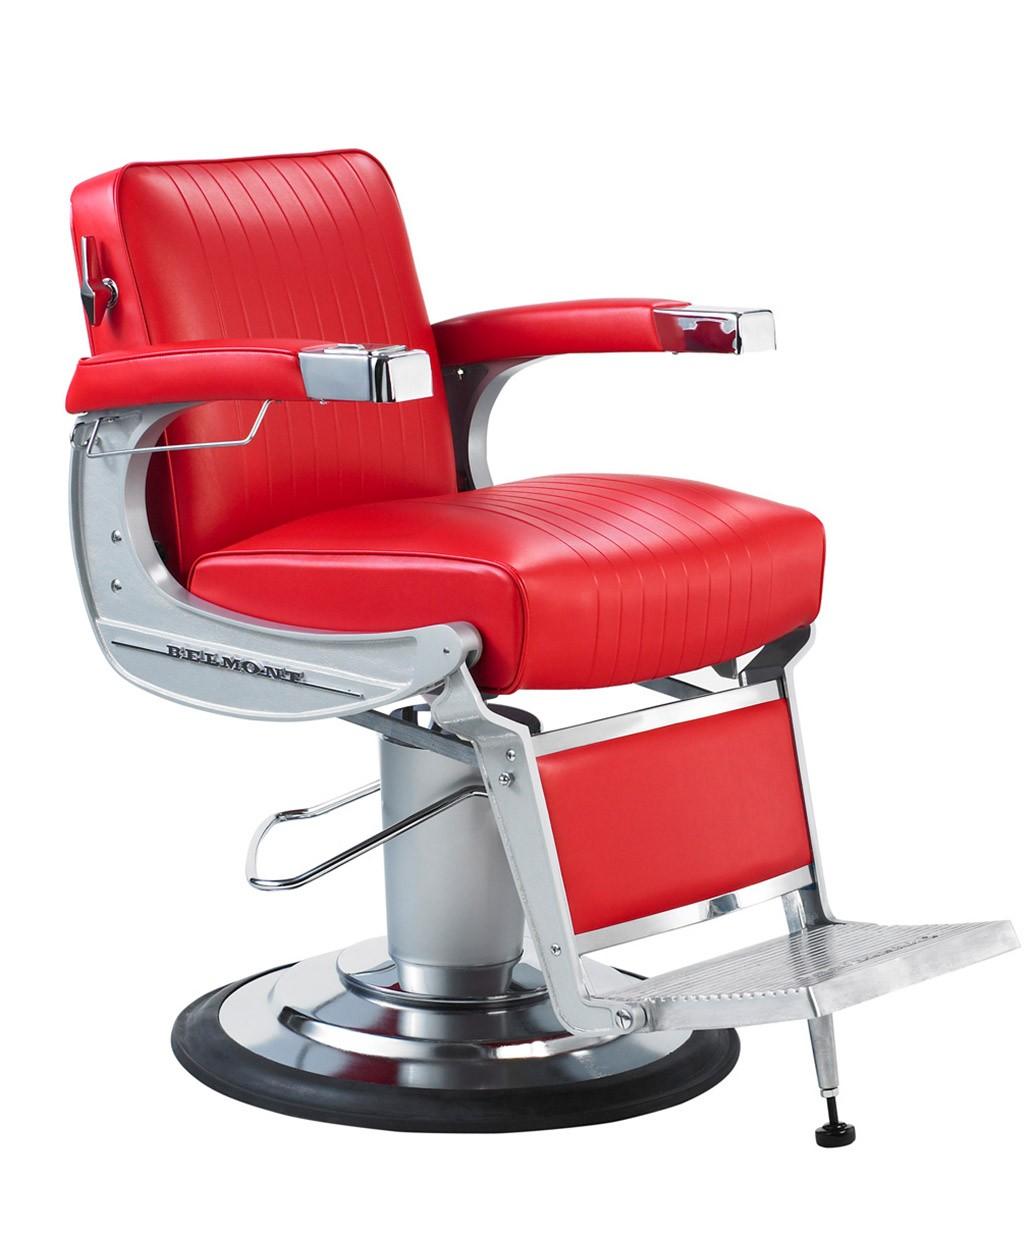 takara belmont bb 225 elegance barber chair